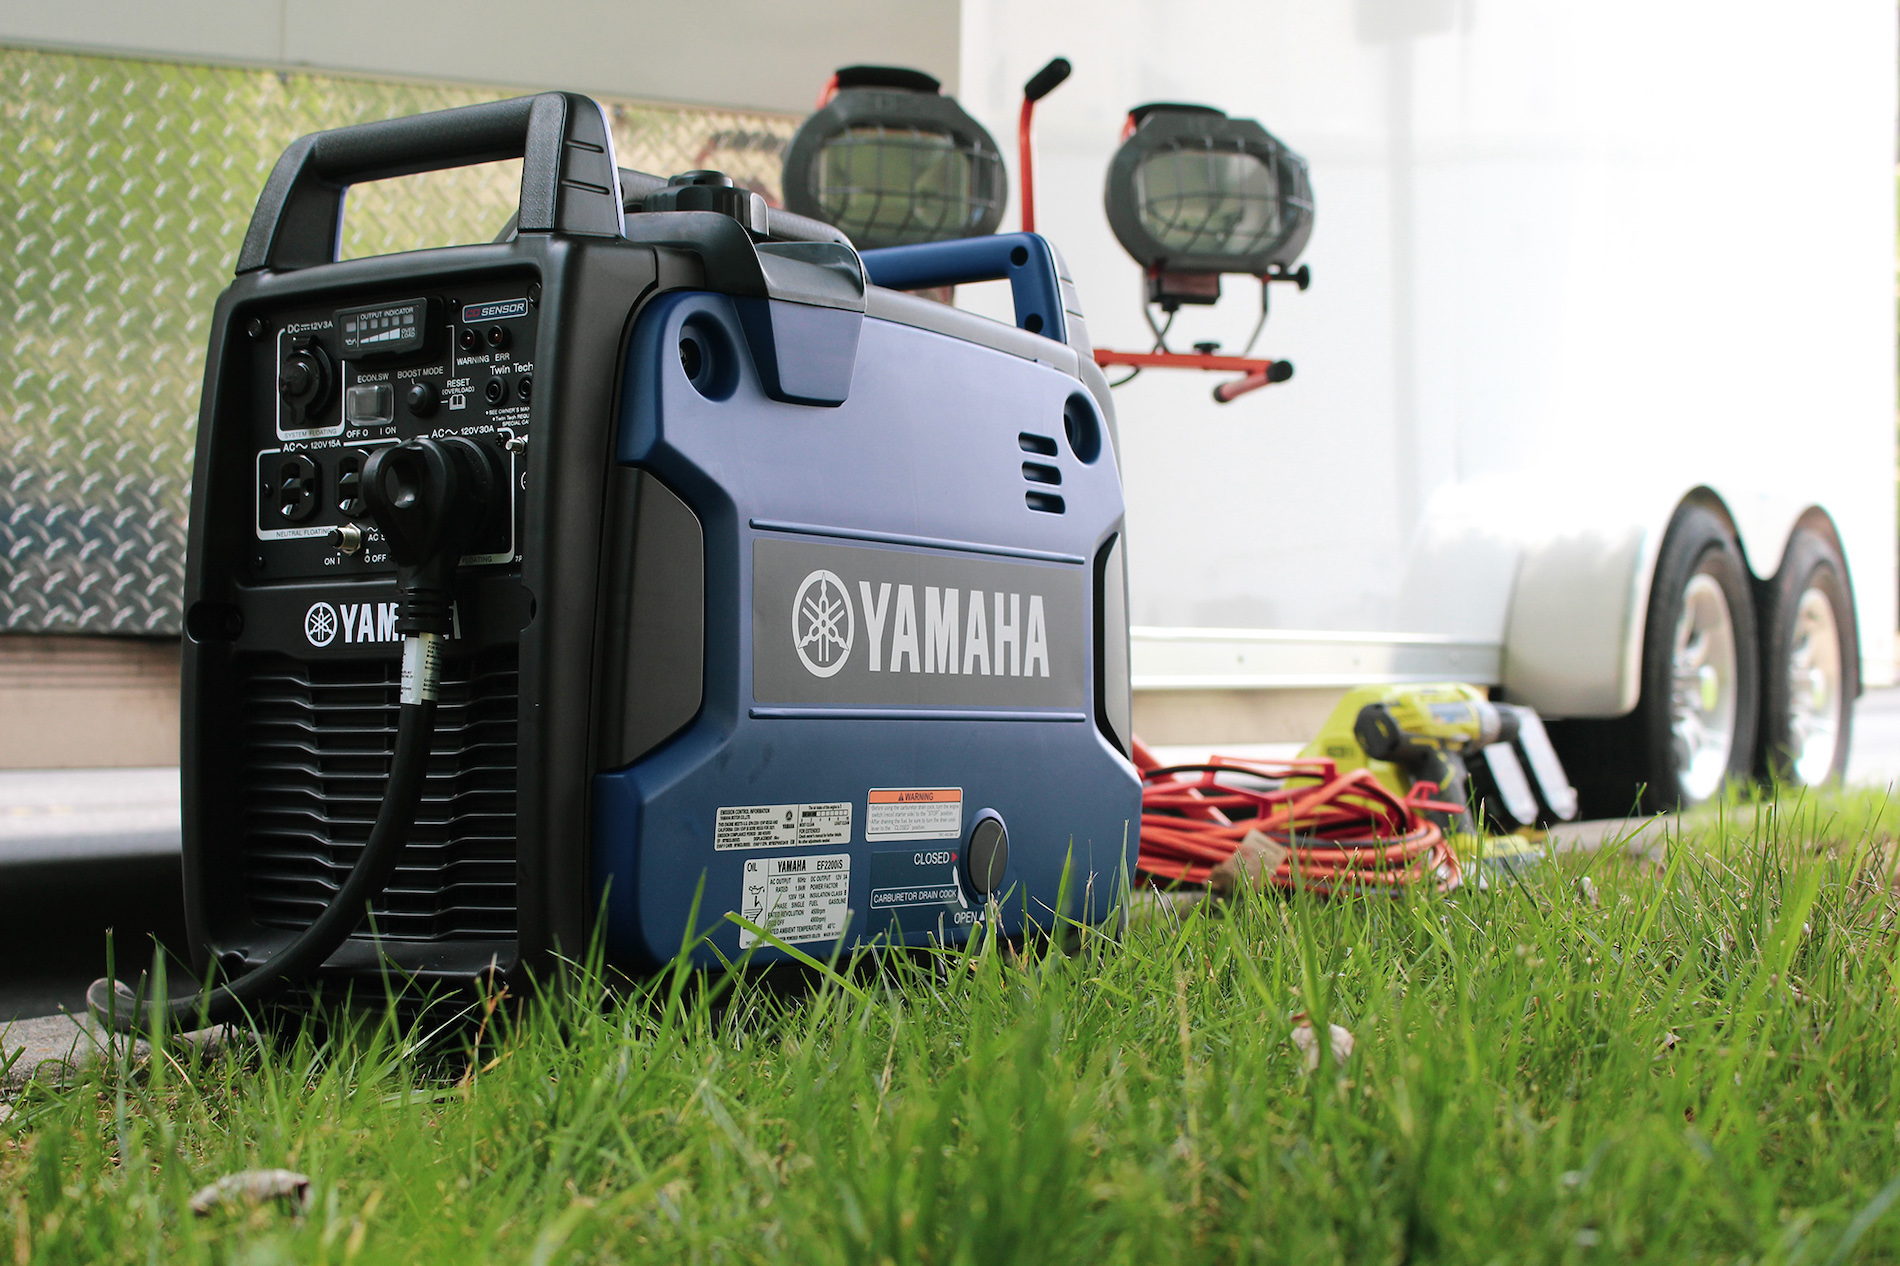 Yamaha EF2200iS portable generator